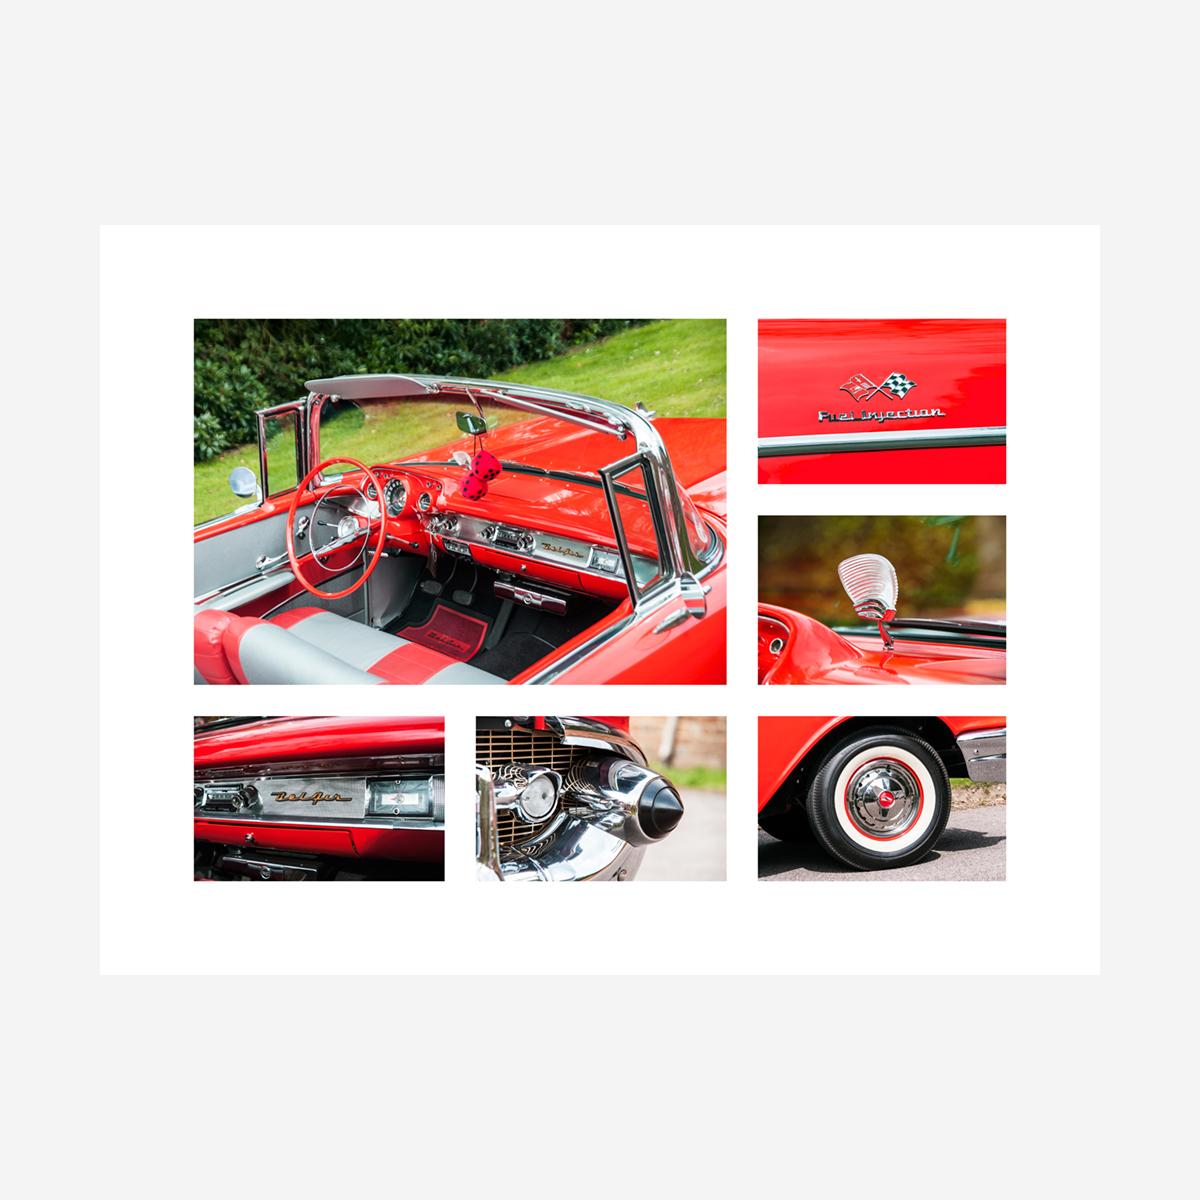 "Chevrolet Bel Air Convertible Details 32"" x 24"""